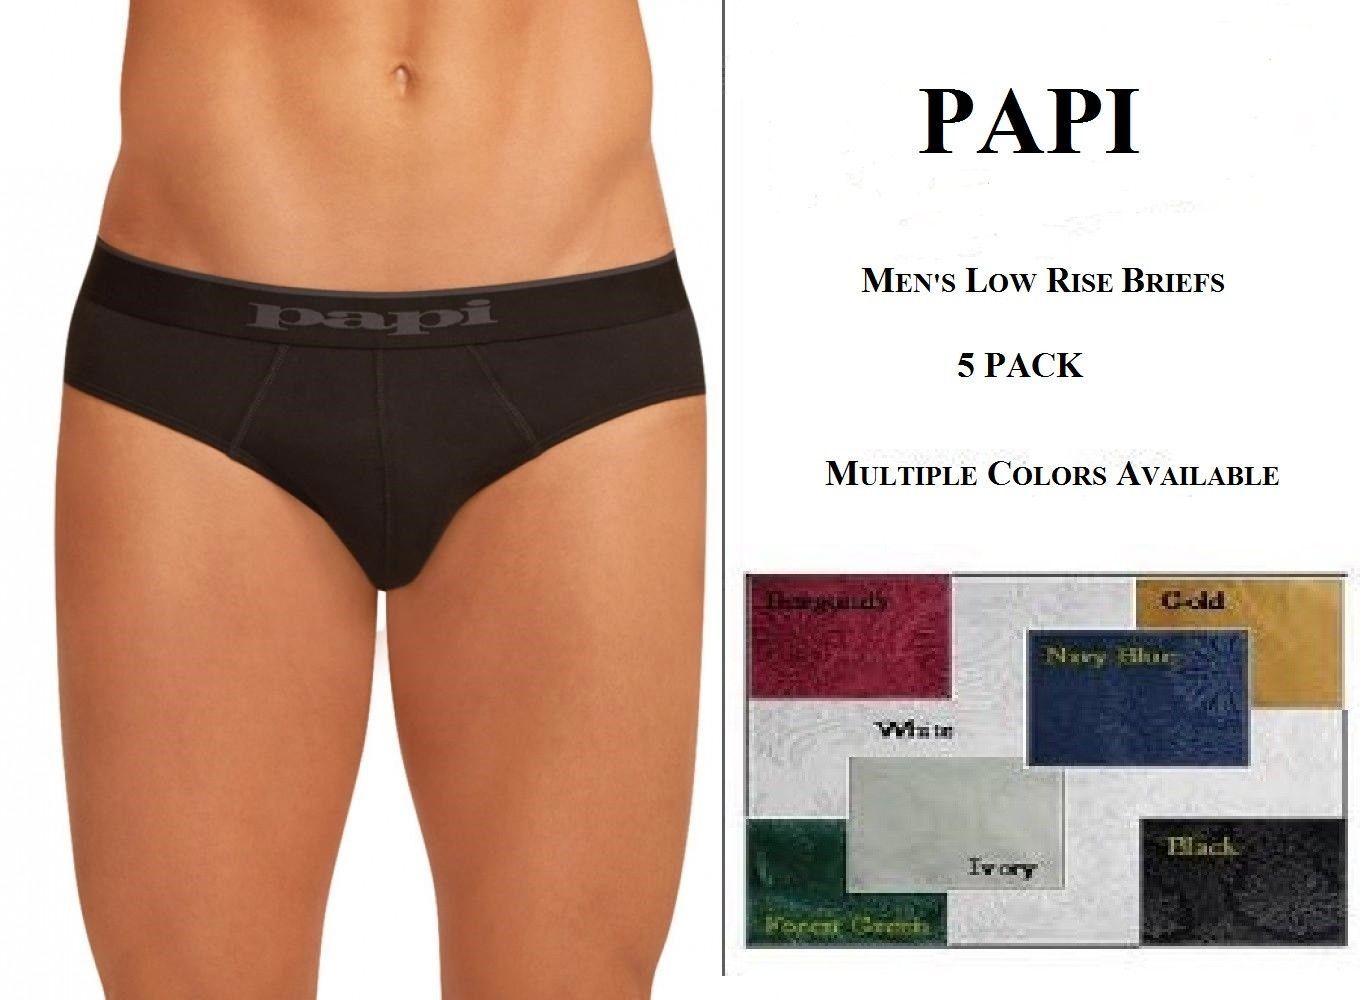 005cf90eec59da 5 pack Papi Men's Low Rise Briefs 100% and 50 similar items. 57